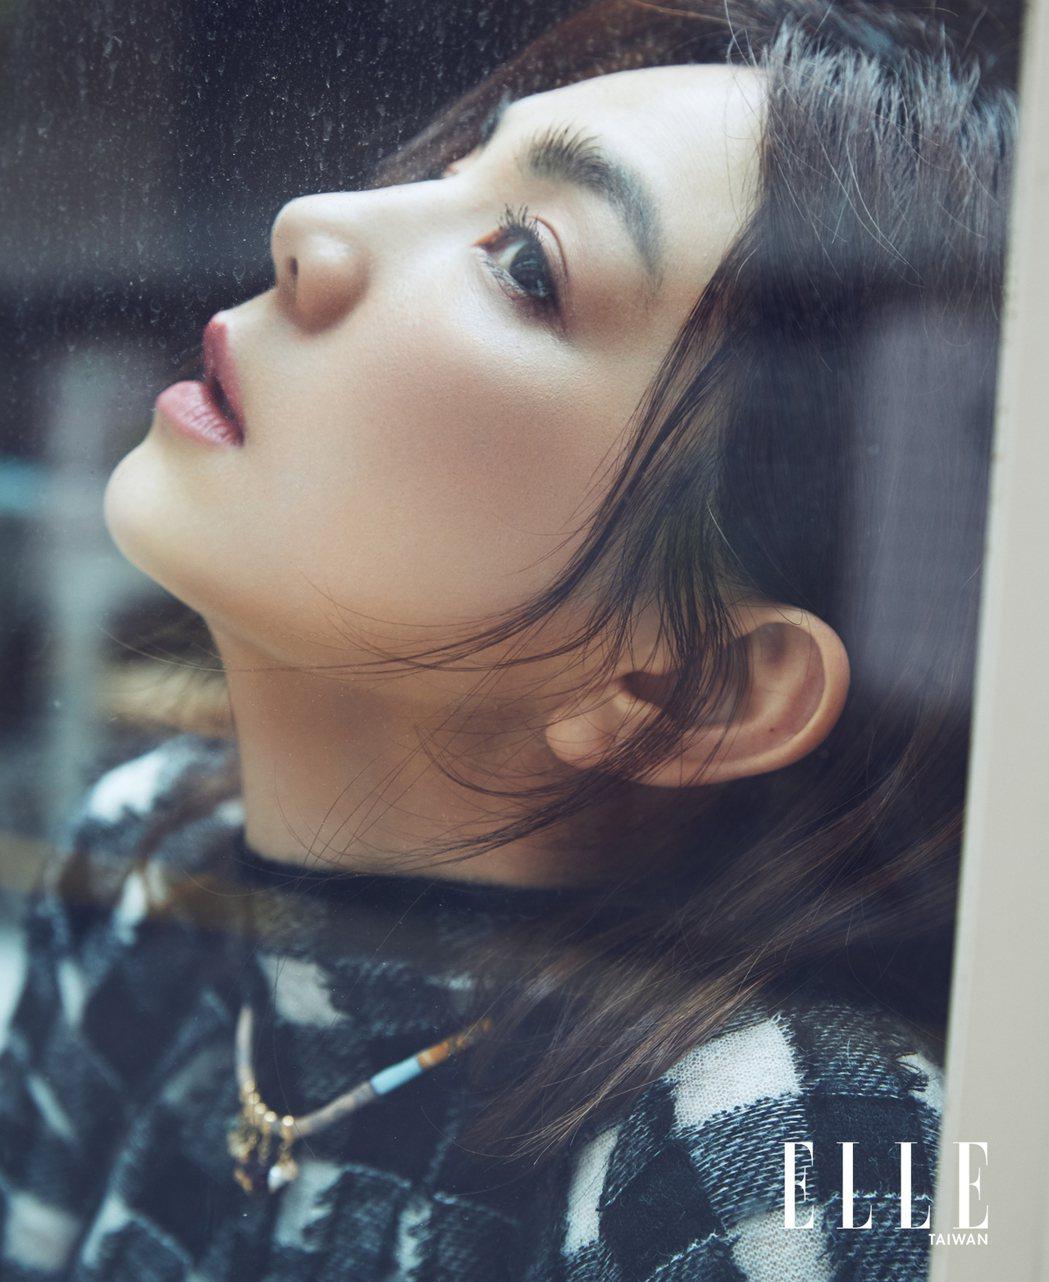 Ella接受雜誌專訪,喊話「為自己好好活一次」。圖/ELLE提供